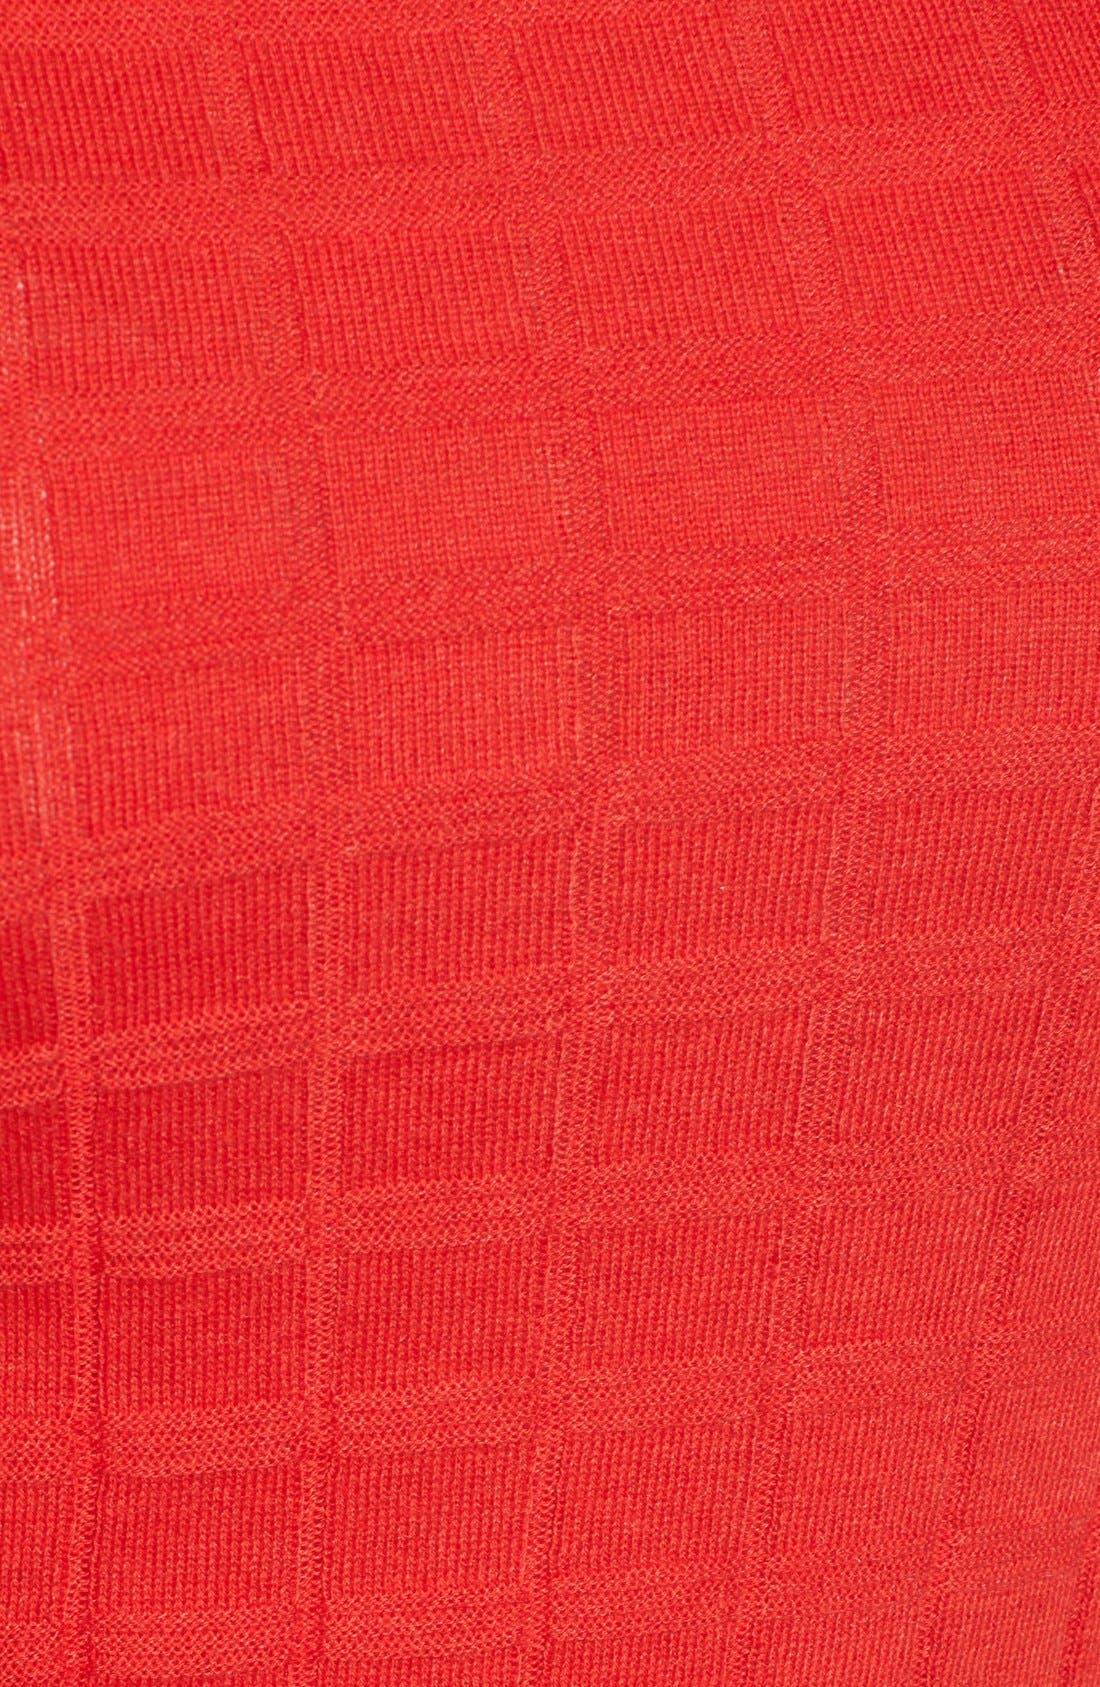 Cotton Blend Pullover,                             Alternate thumbnail 142, color,